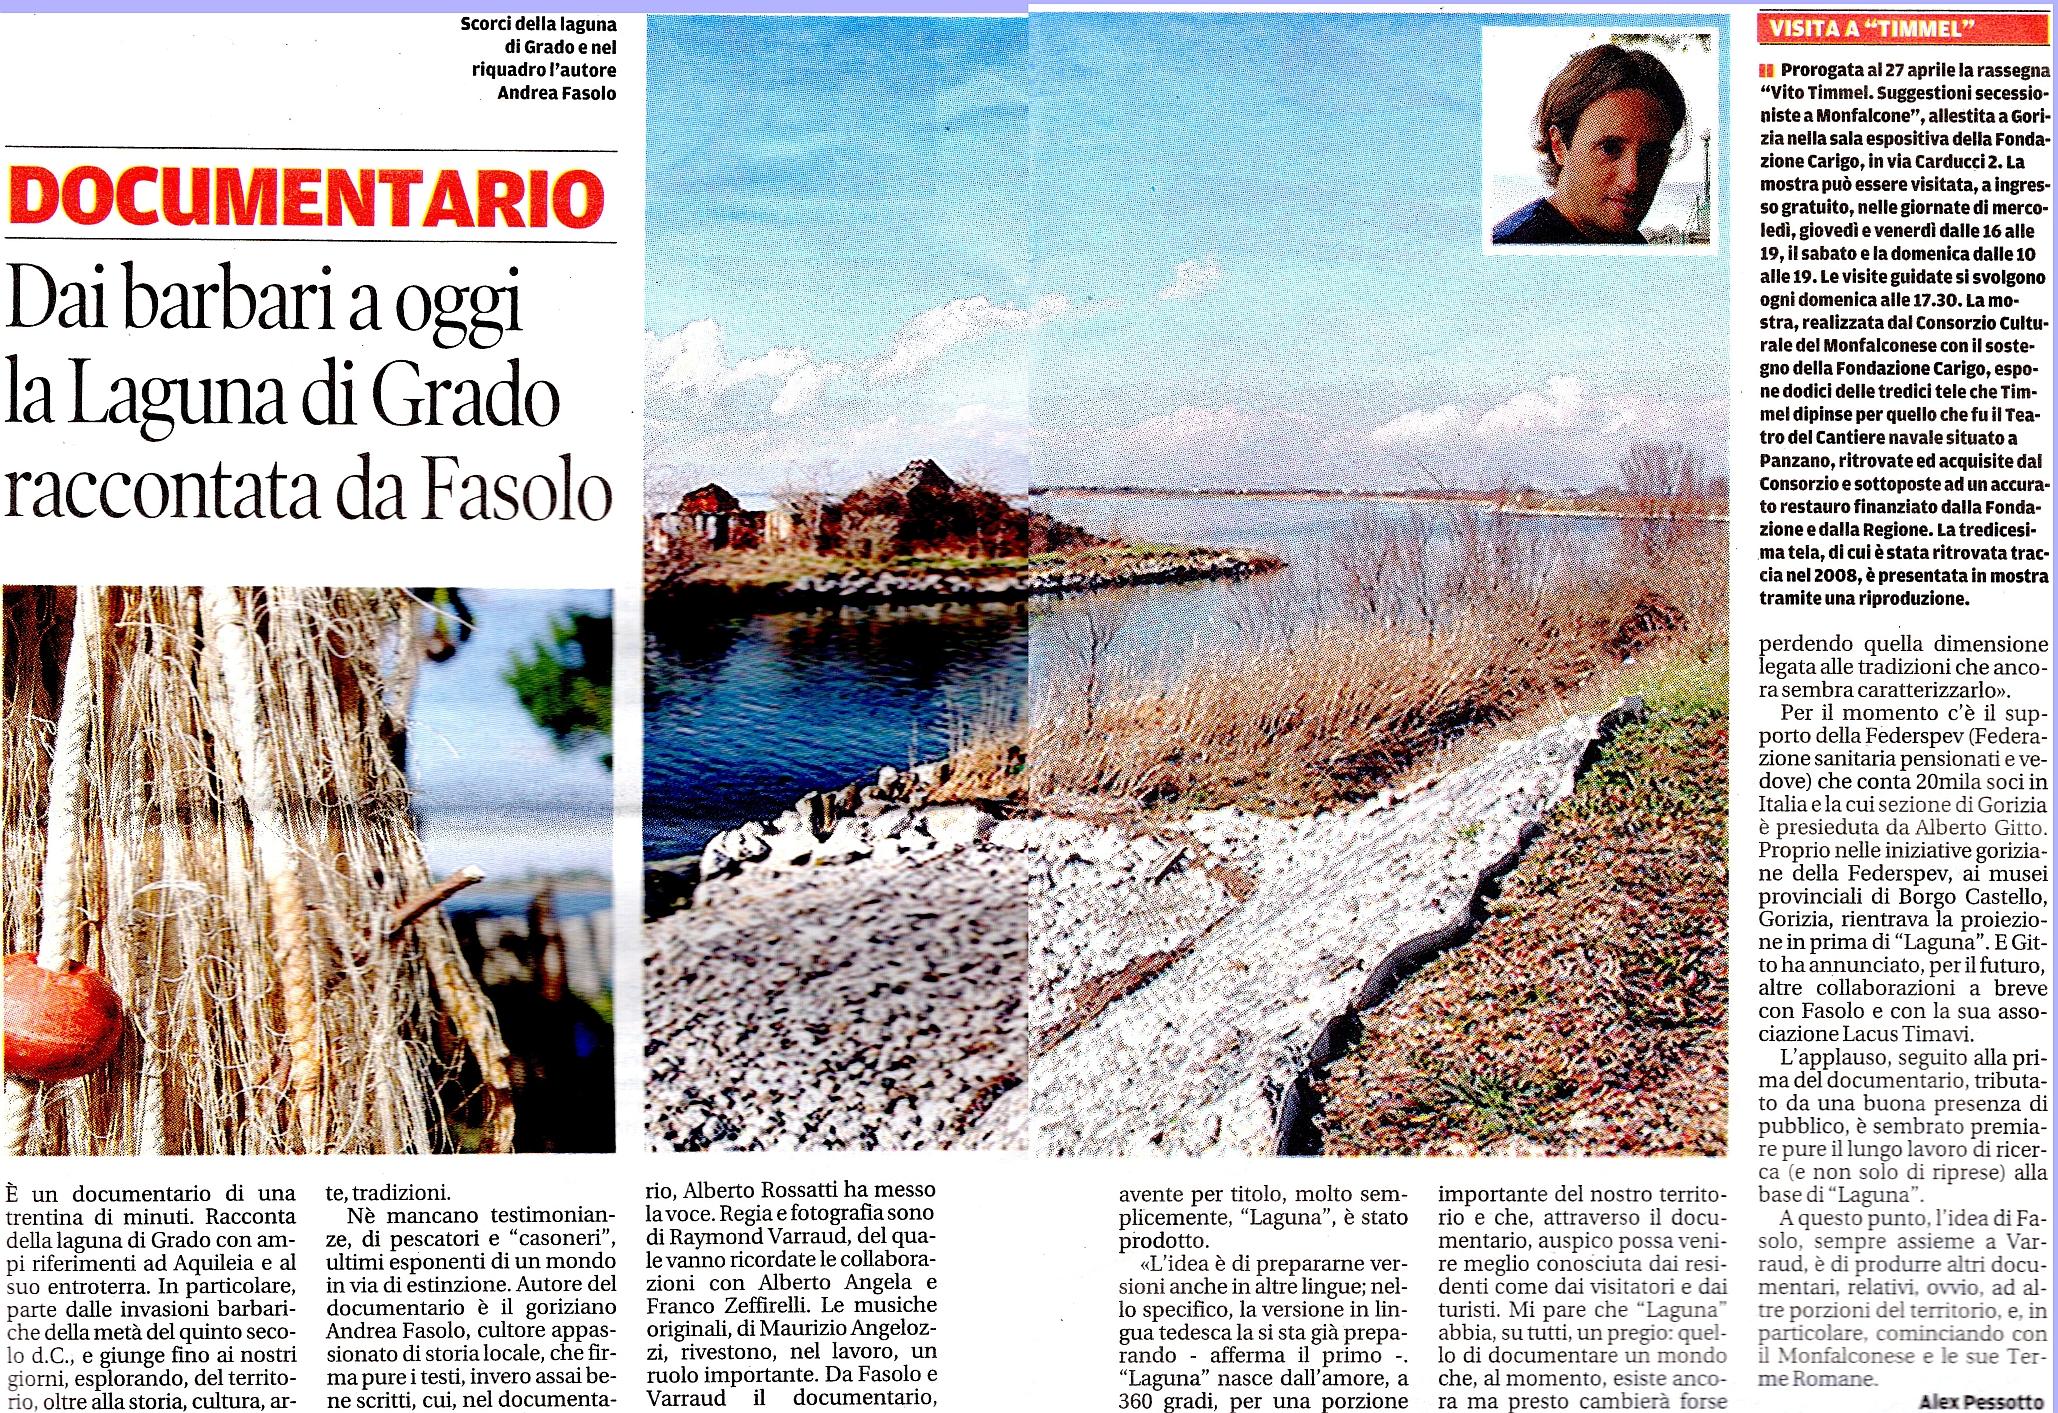 Laguna di Grado; lagunadoc; documentario sulla laguna di Grado